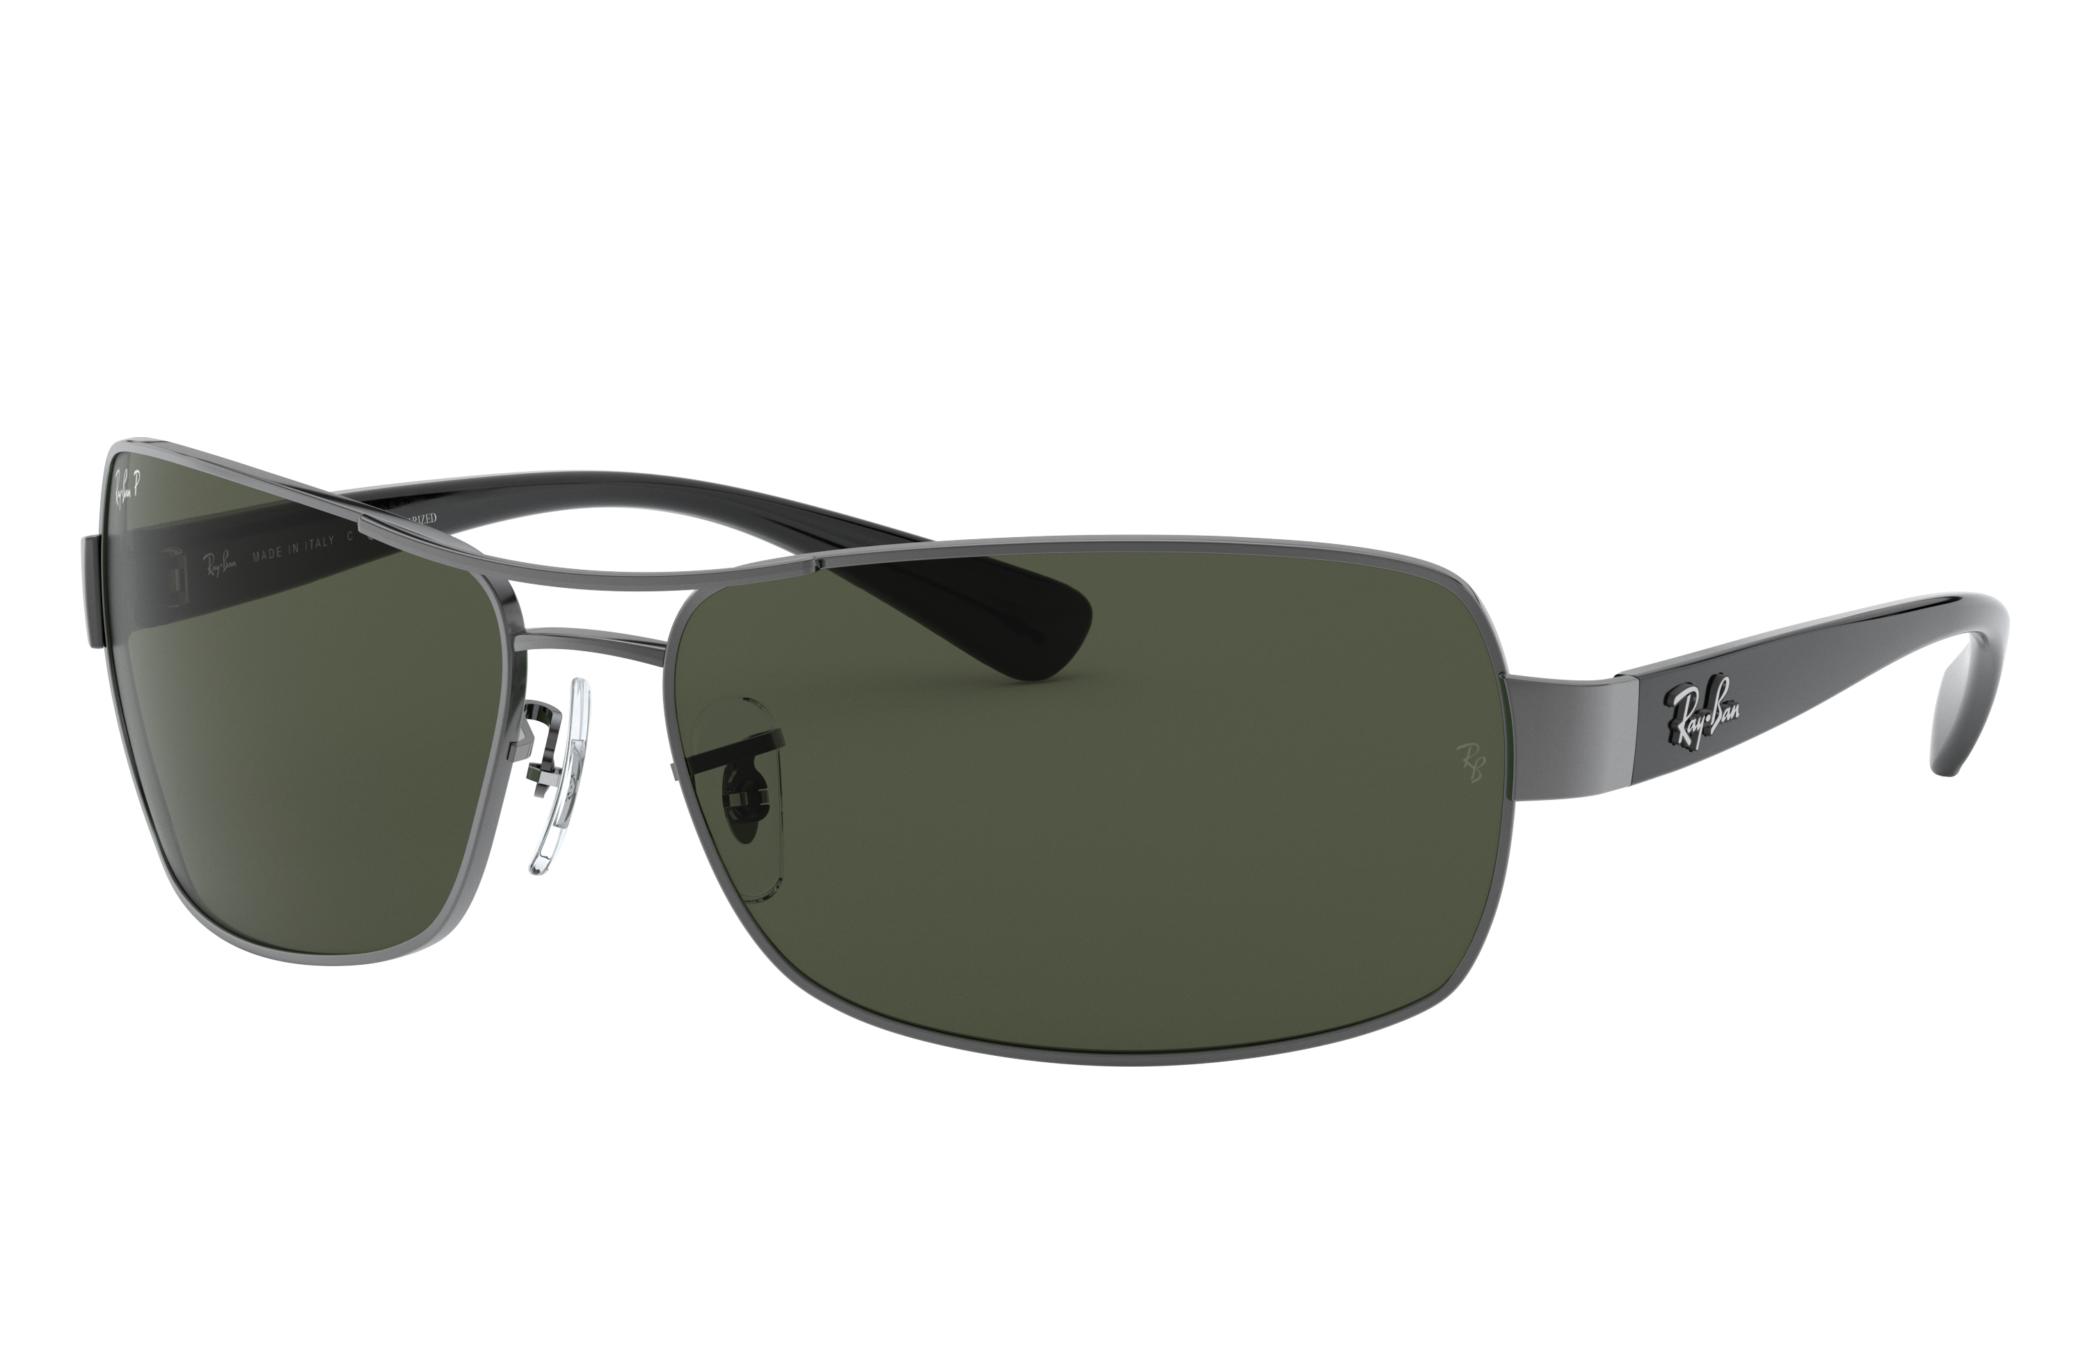 Ray-Ban Rb3379 Black, Polarized Green Lenses - RB3379